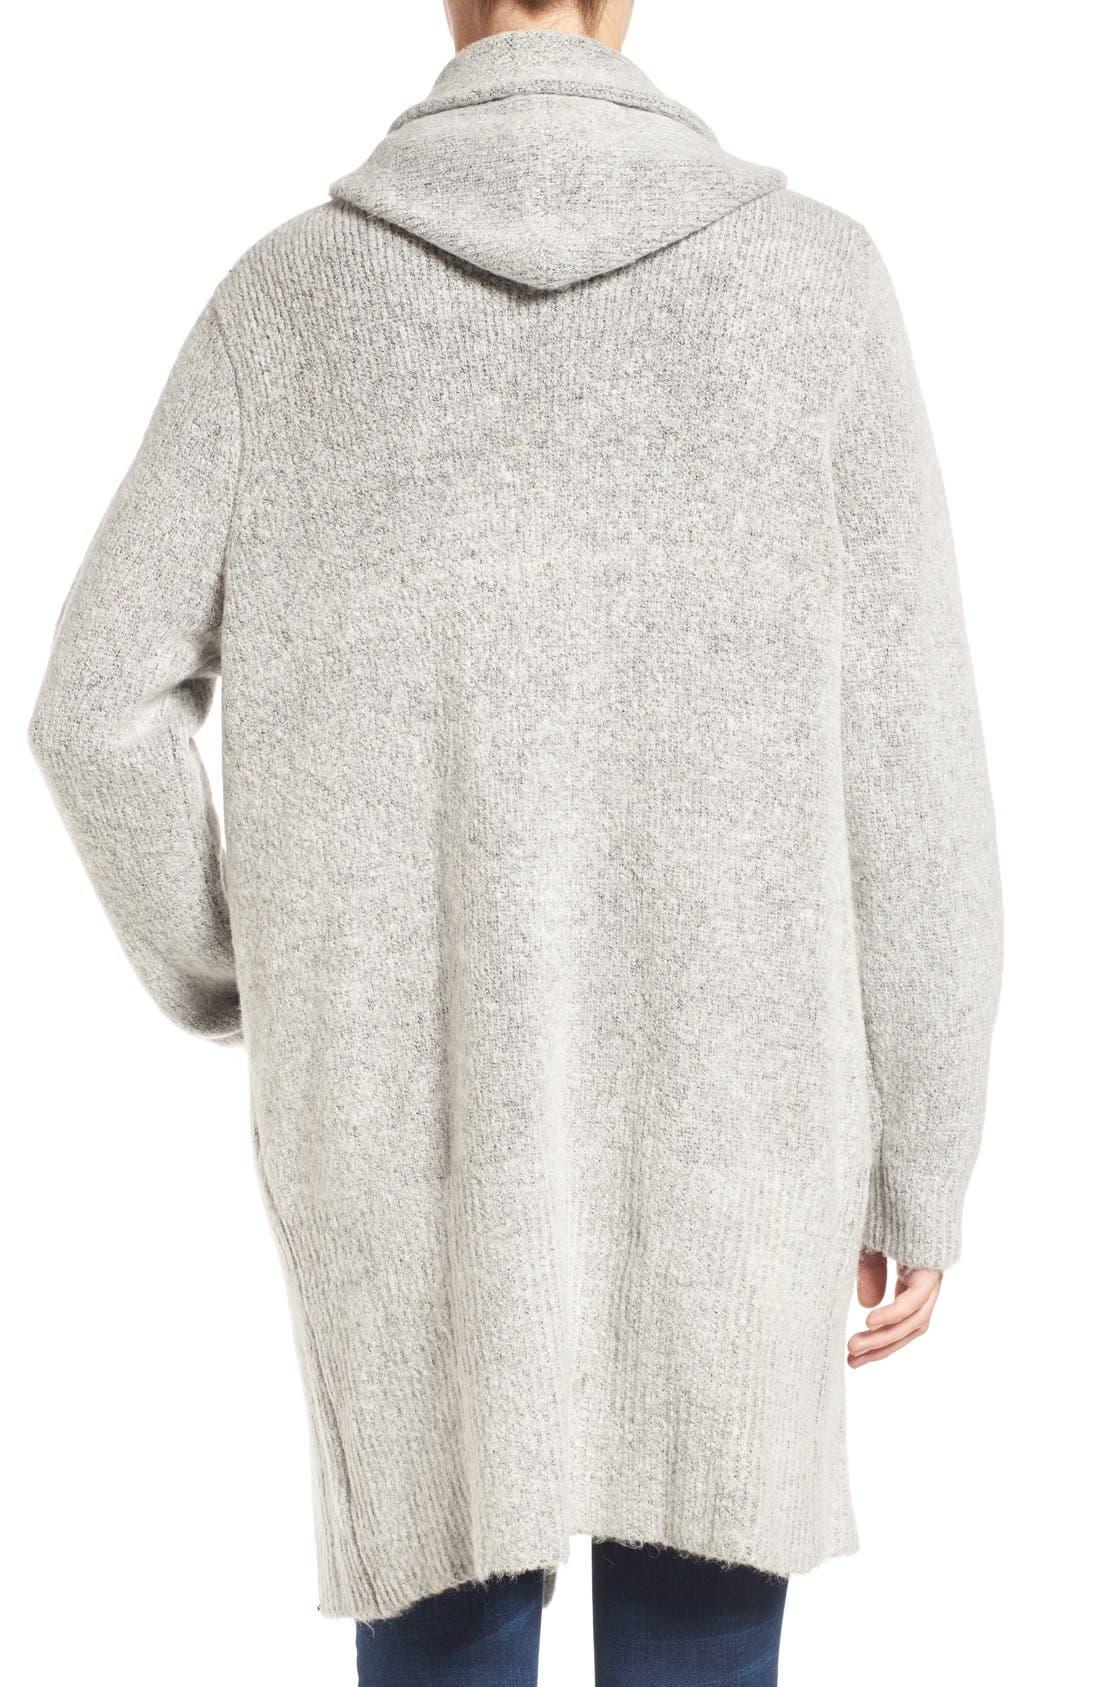 Alternate Image 2  - BLANKNYC 'Textationship' Knit Hooded Cardigan